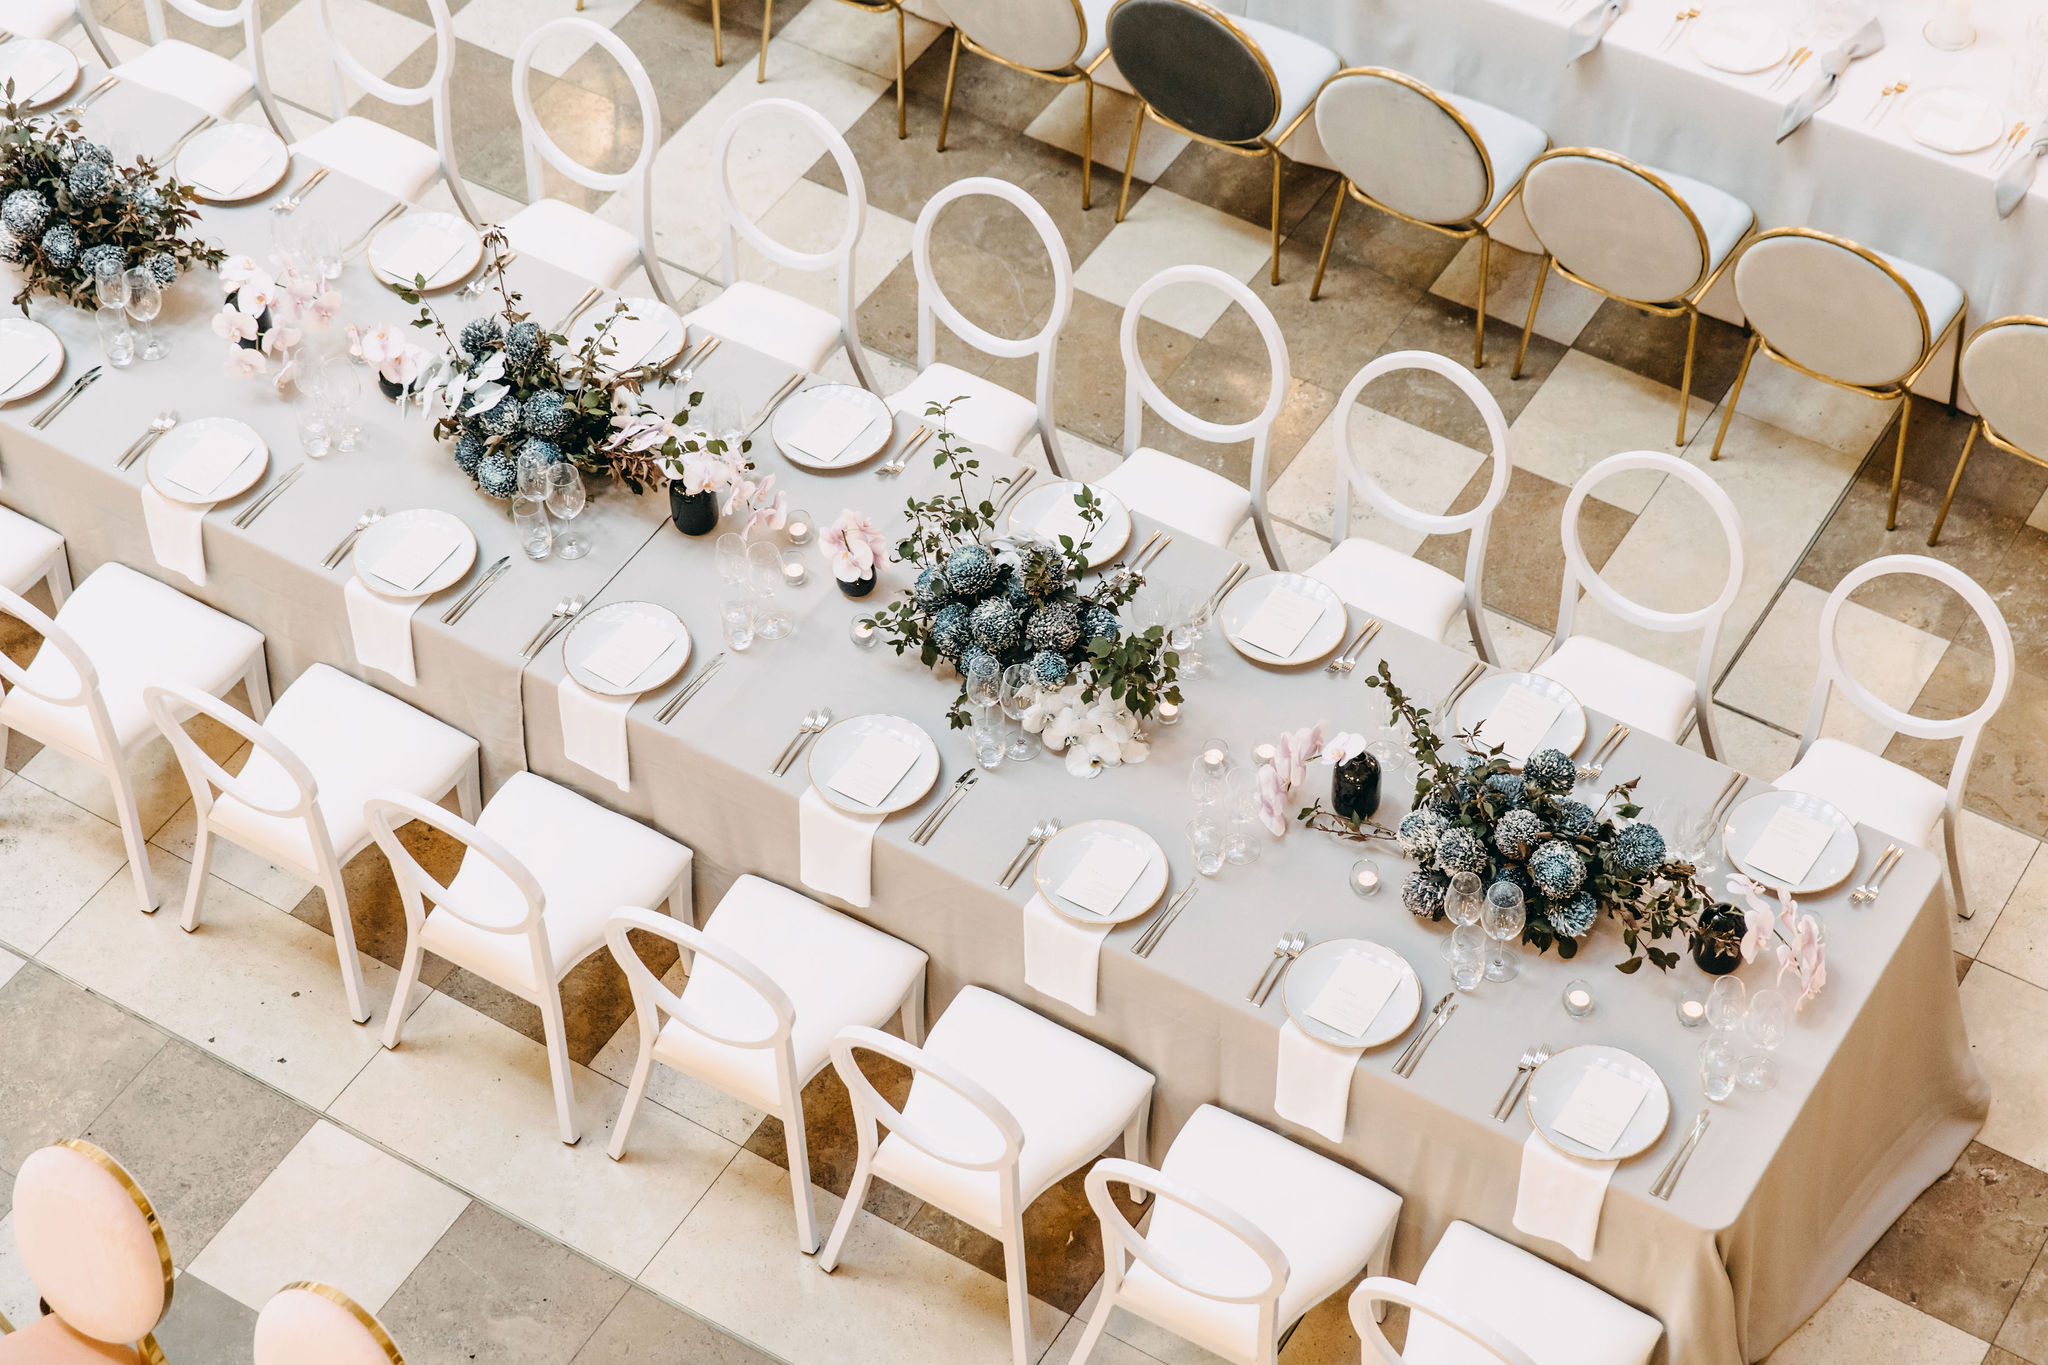 STATEBUILDINGS-WEDDINGOPENDAY-2019_SUPPLIED_099